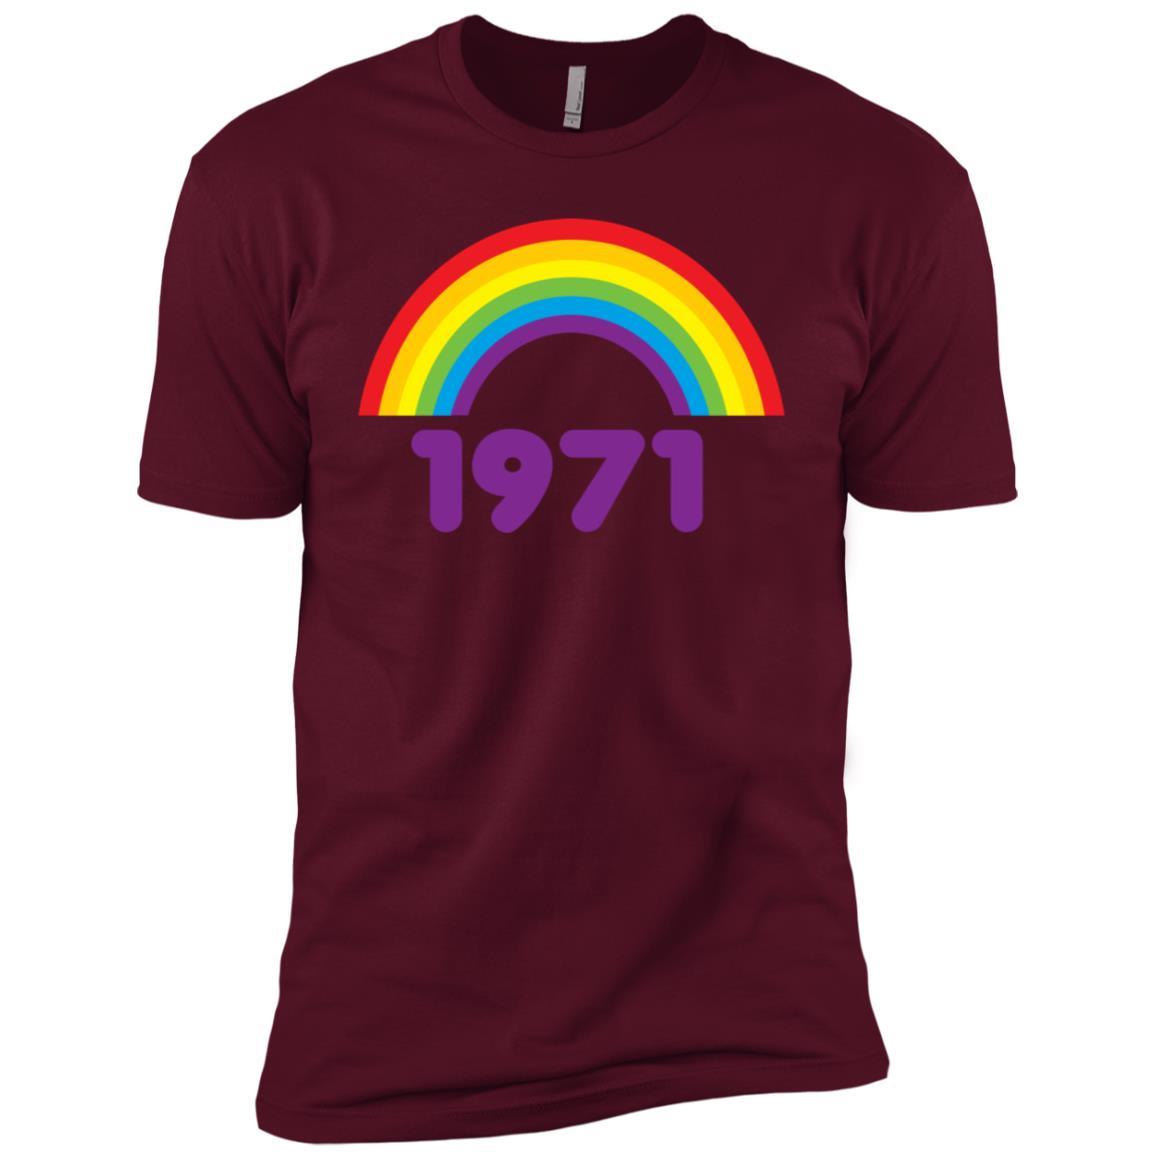 70s s for Women Vintage 1971 Rainbow Men Short Sleeve T-Shirt